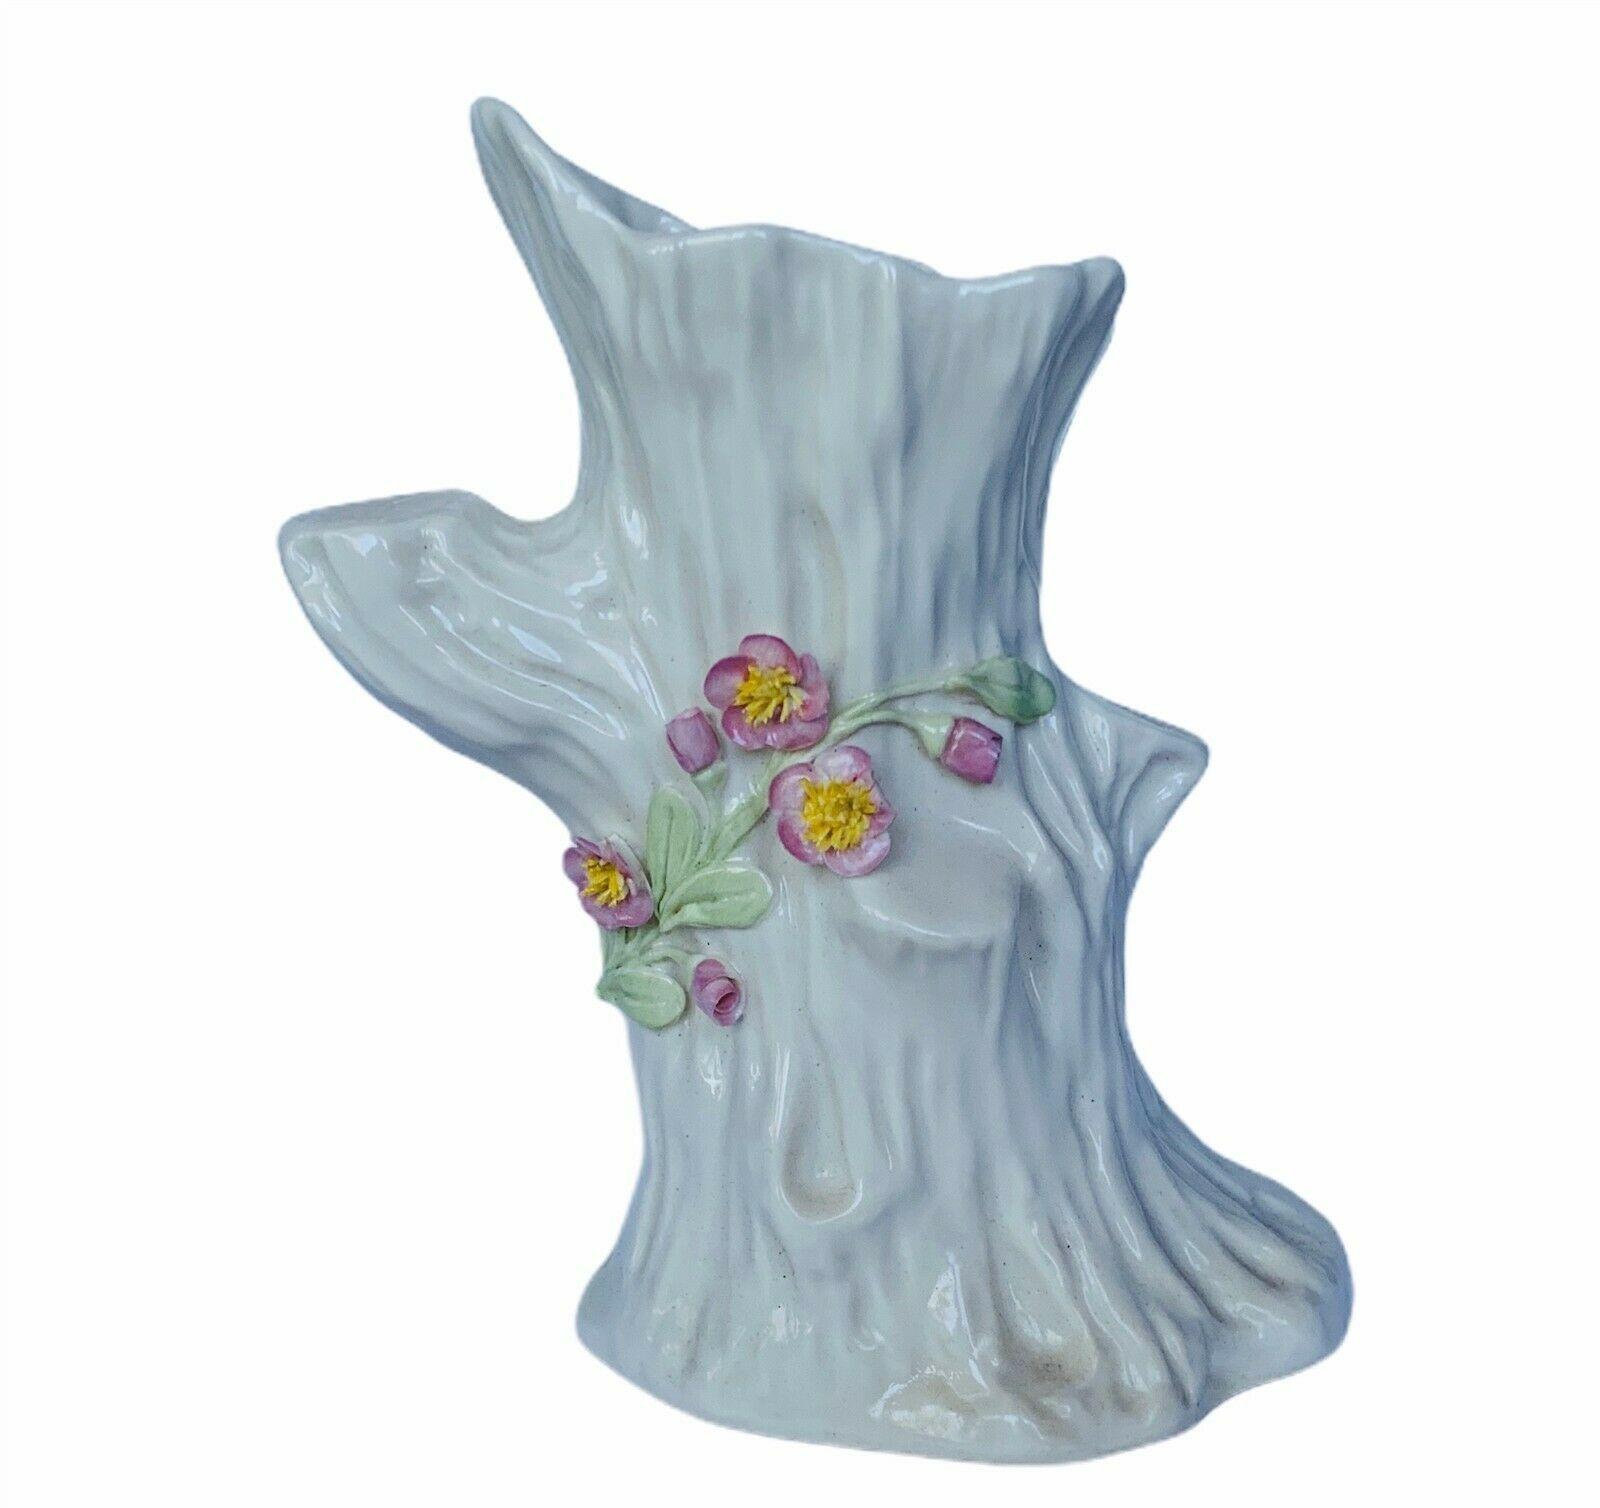 Belleek vase flower planter Ireland porcelain tree stump floral vtg retrospect - $48.33